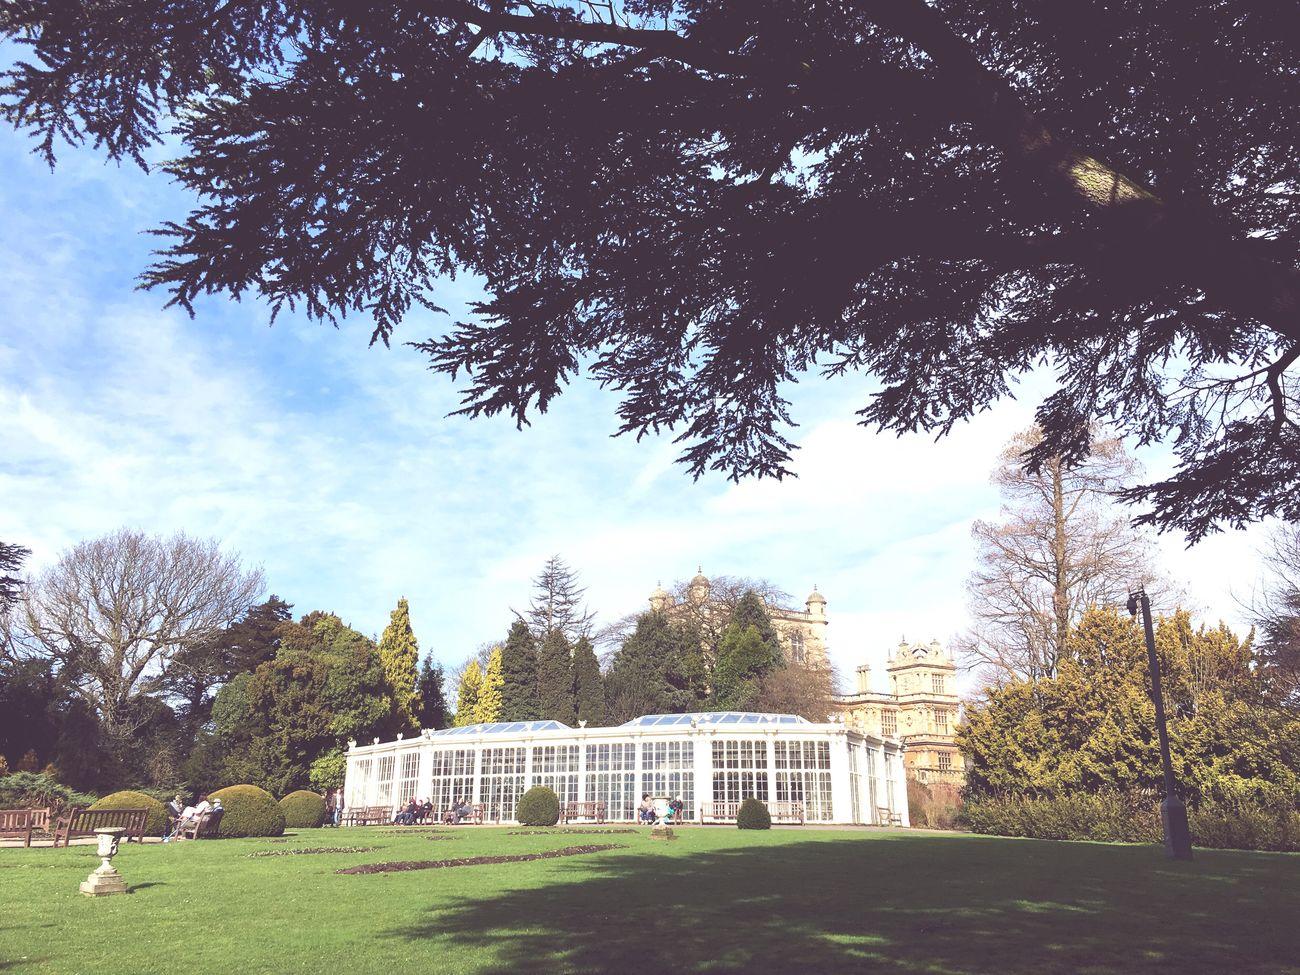 Wollaton Hall Garden Conservatory